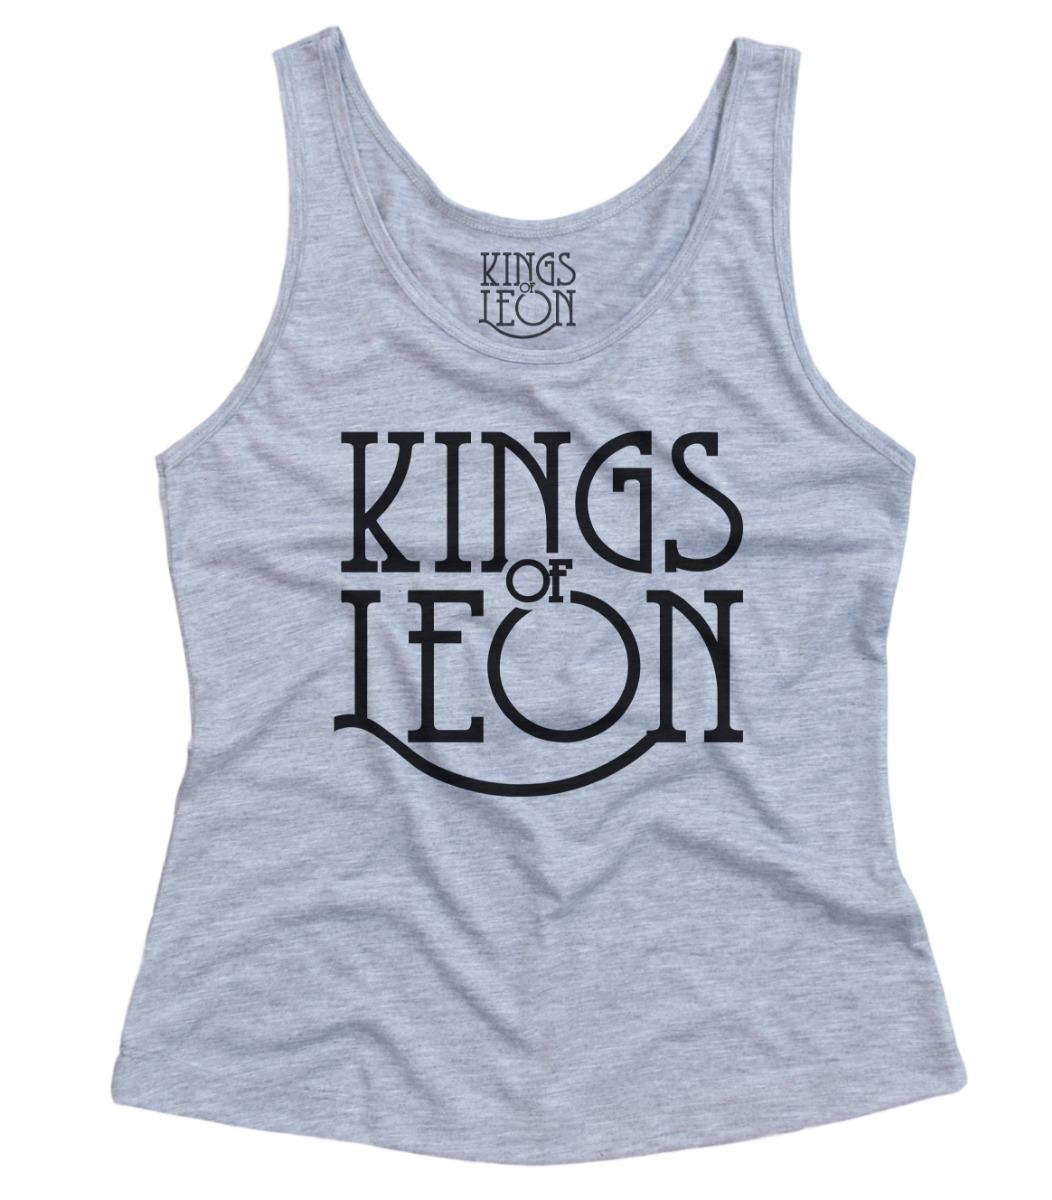 1d8d7288f527 camiseta regata feminina kings of leon banda rock. Carregando zoom.